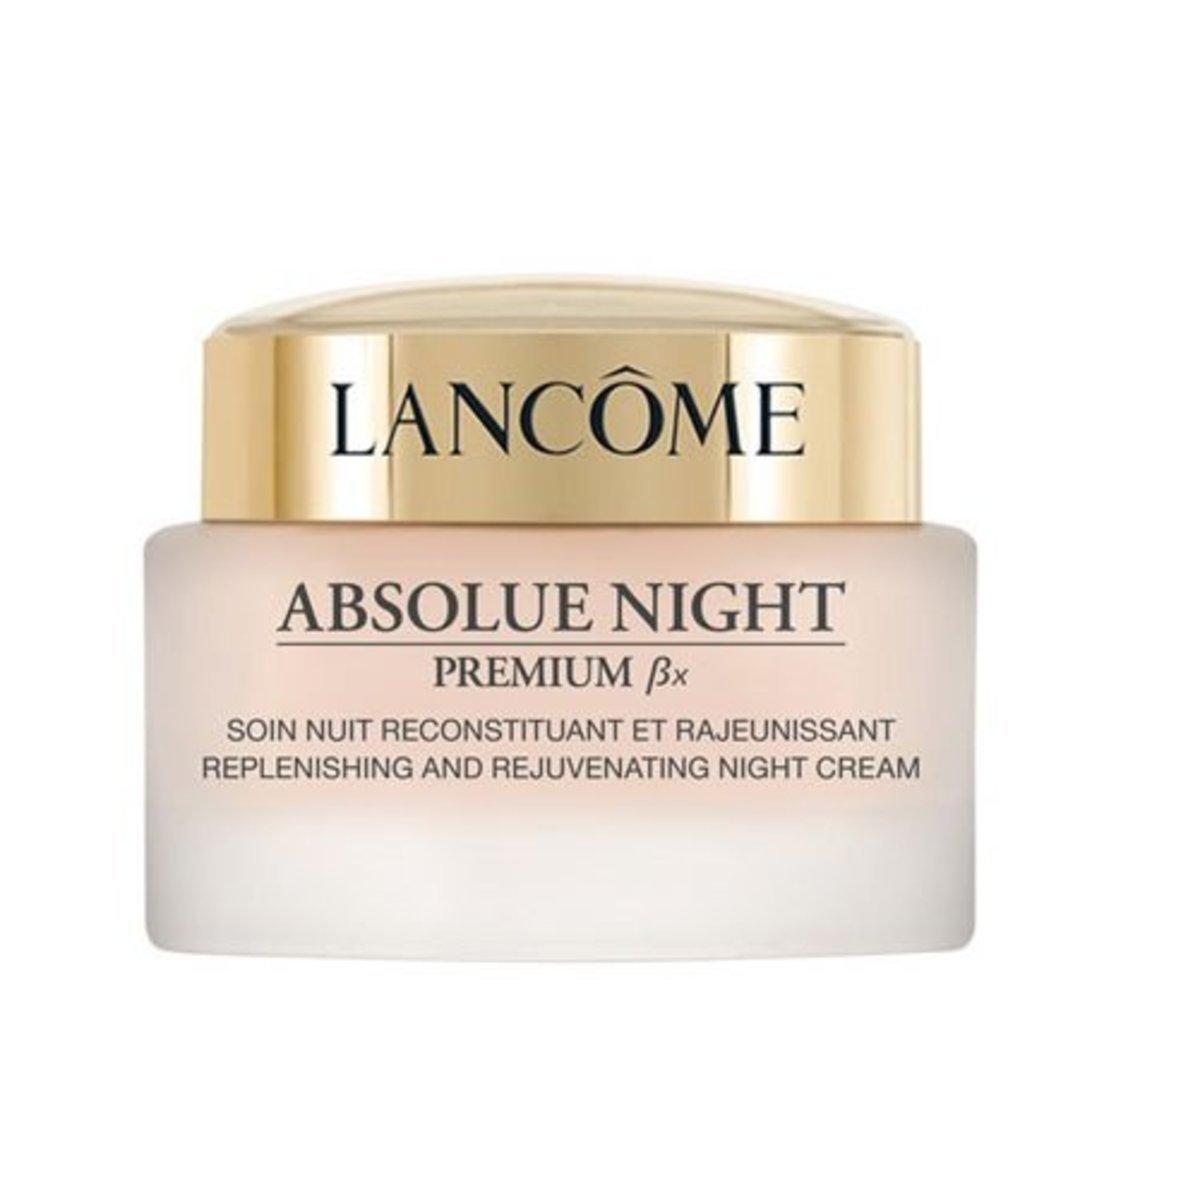 ABSOLUE NIGHT Premium BX Replenshing and Rejuvenating Night Cream 50ml (Parallel Import)